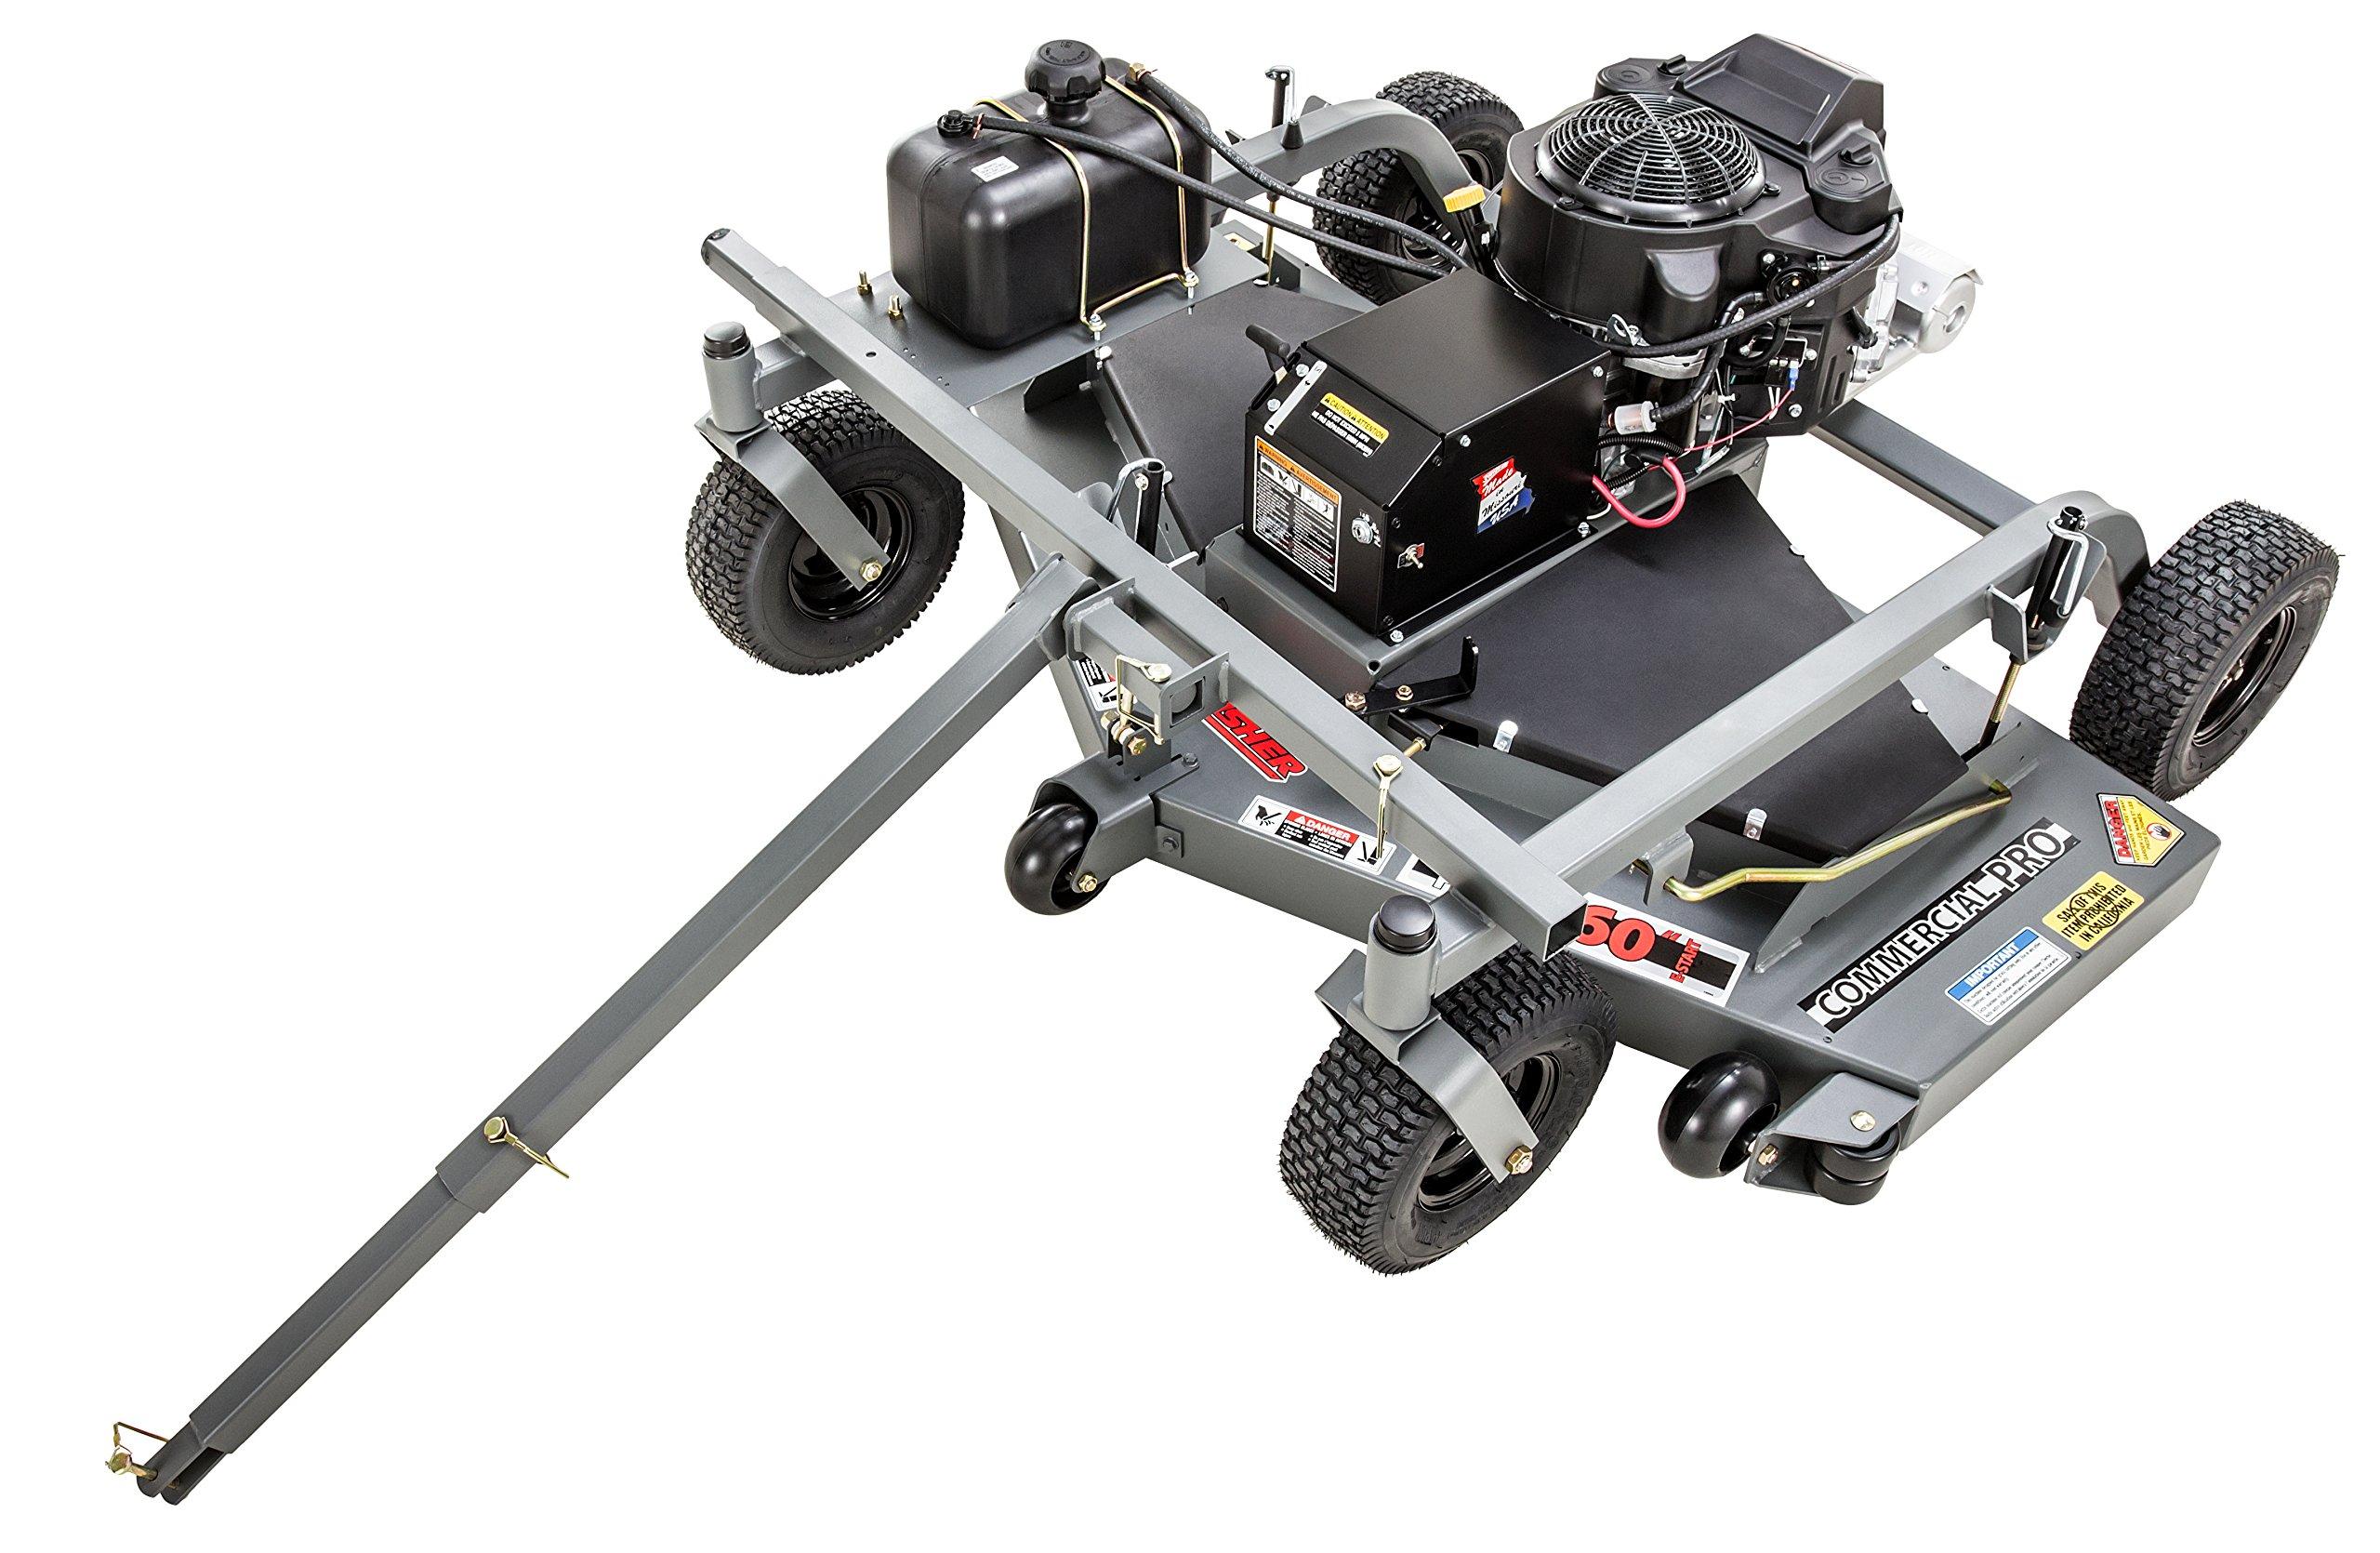 Swisher FC14560CPKA 14.5 HP 12V Kawasaki 60'' Commercial Pro Trail Mower Trailmower, Gray by Swisher